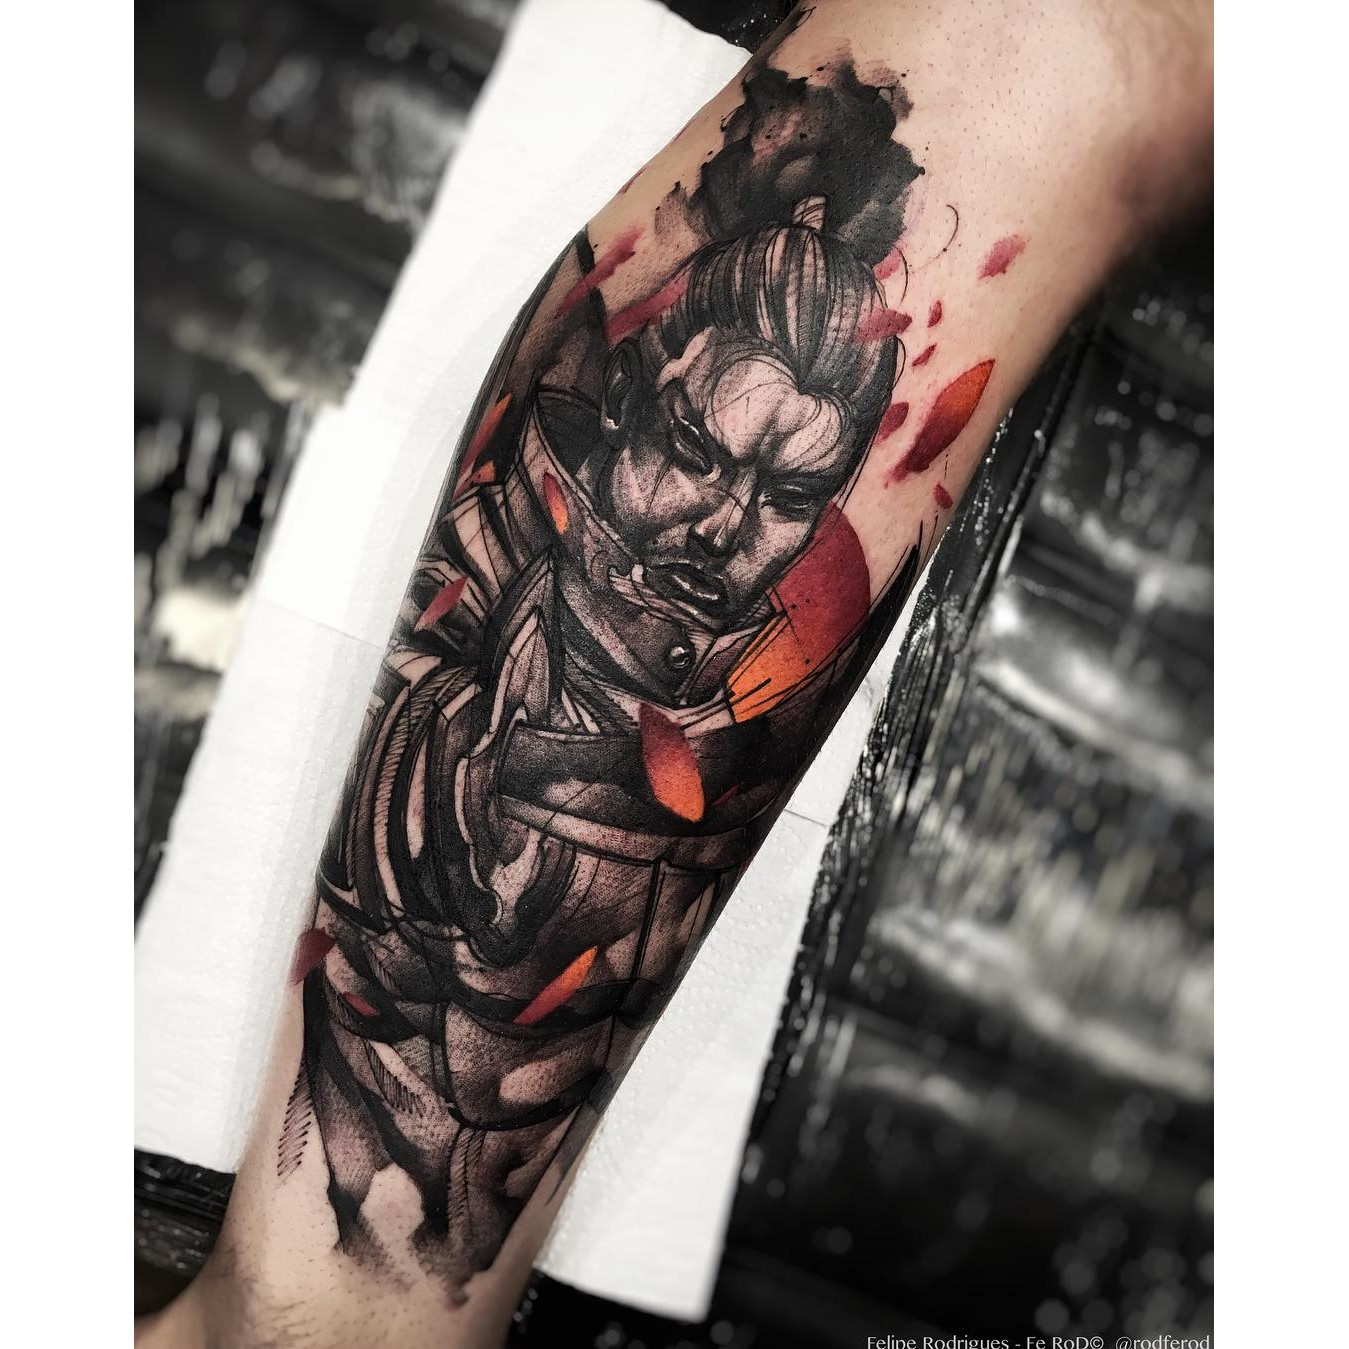 felipe rodrigues tattoo   find the best tattoo artists